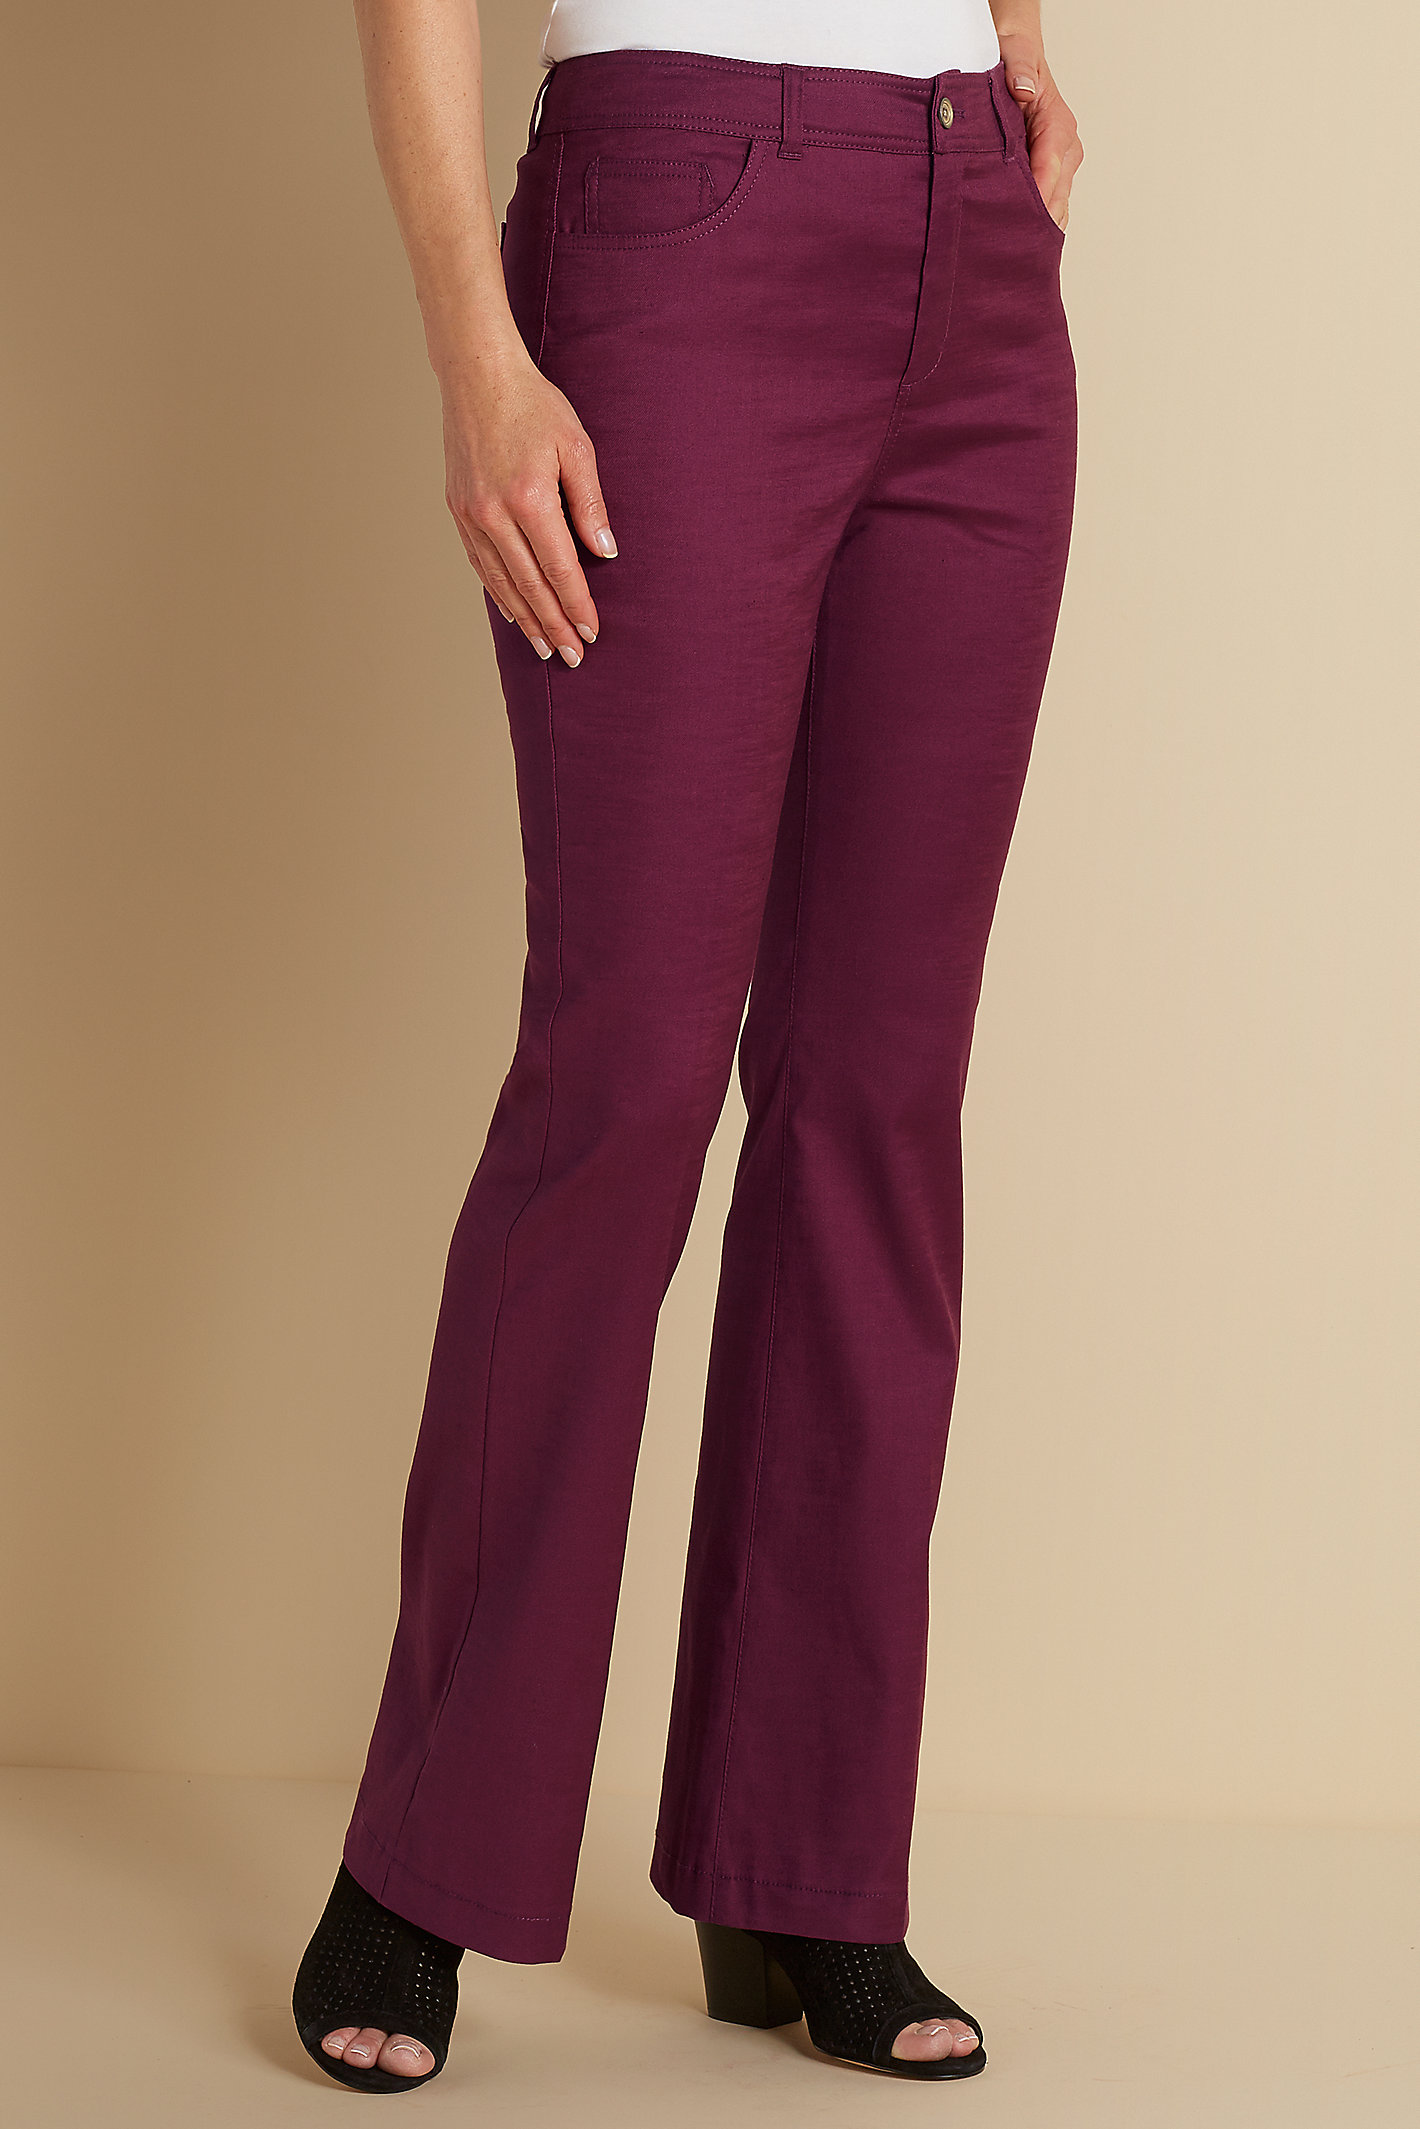 Allure Stretch Pants